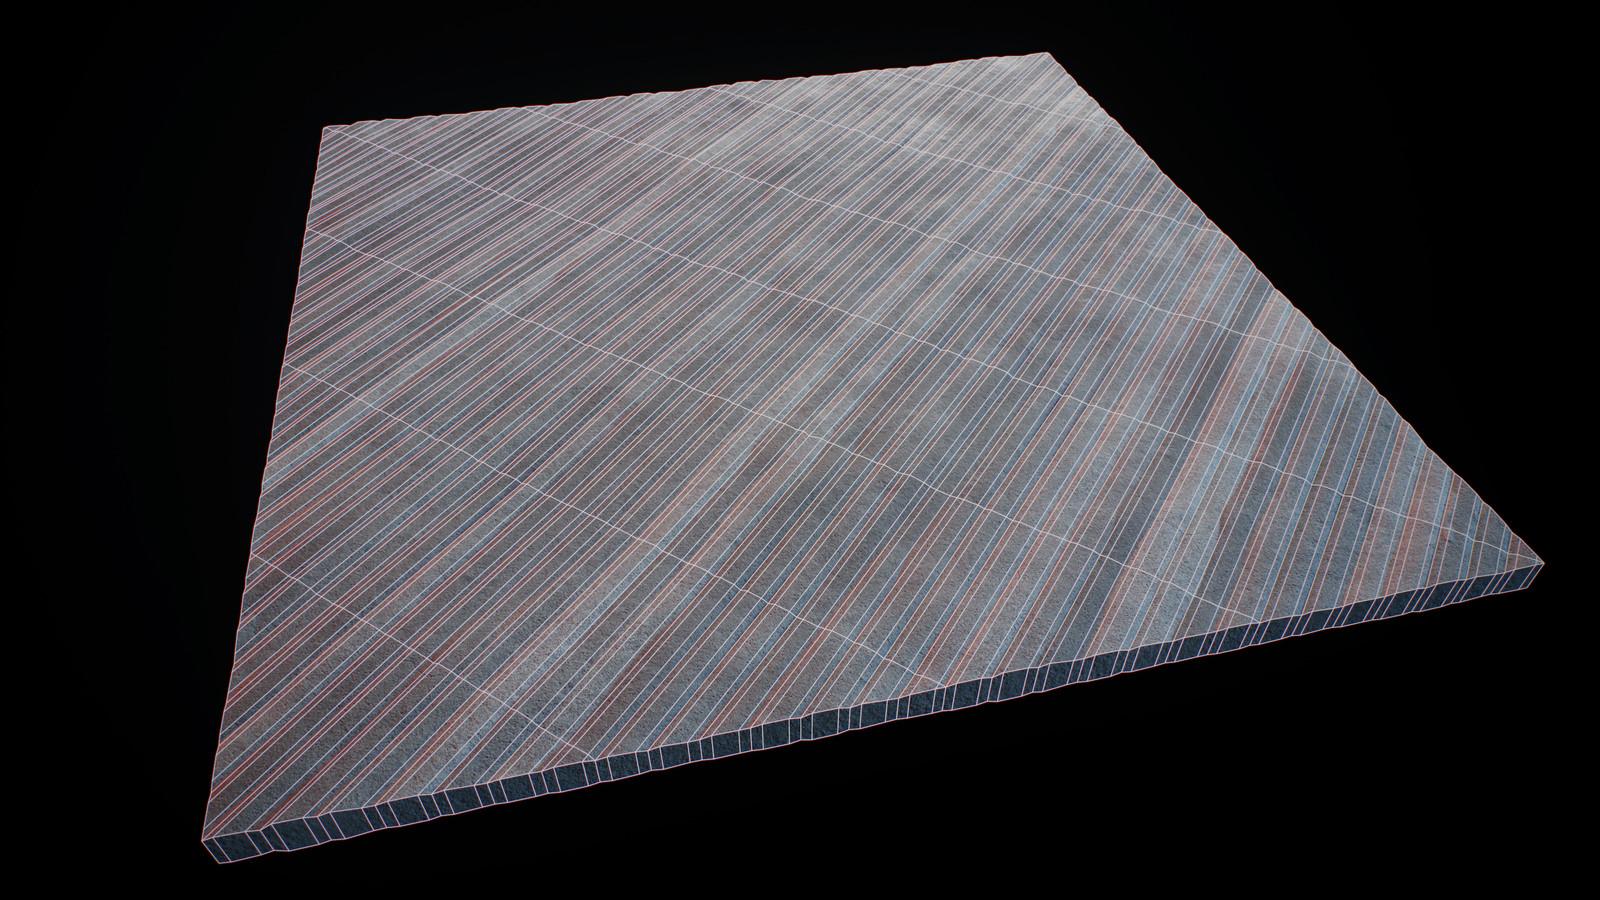 Floor Wireframe